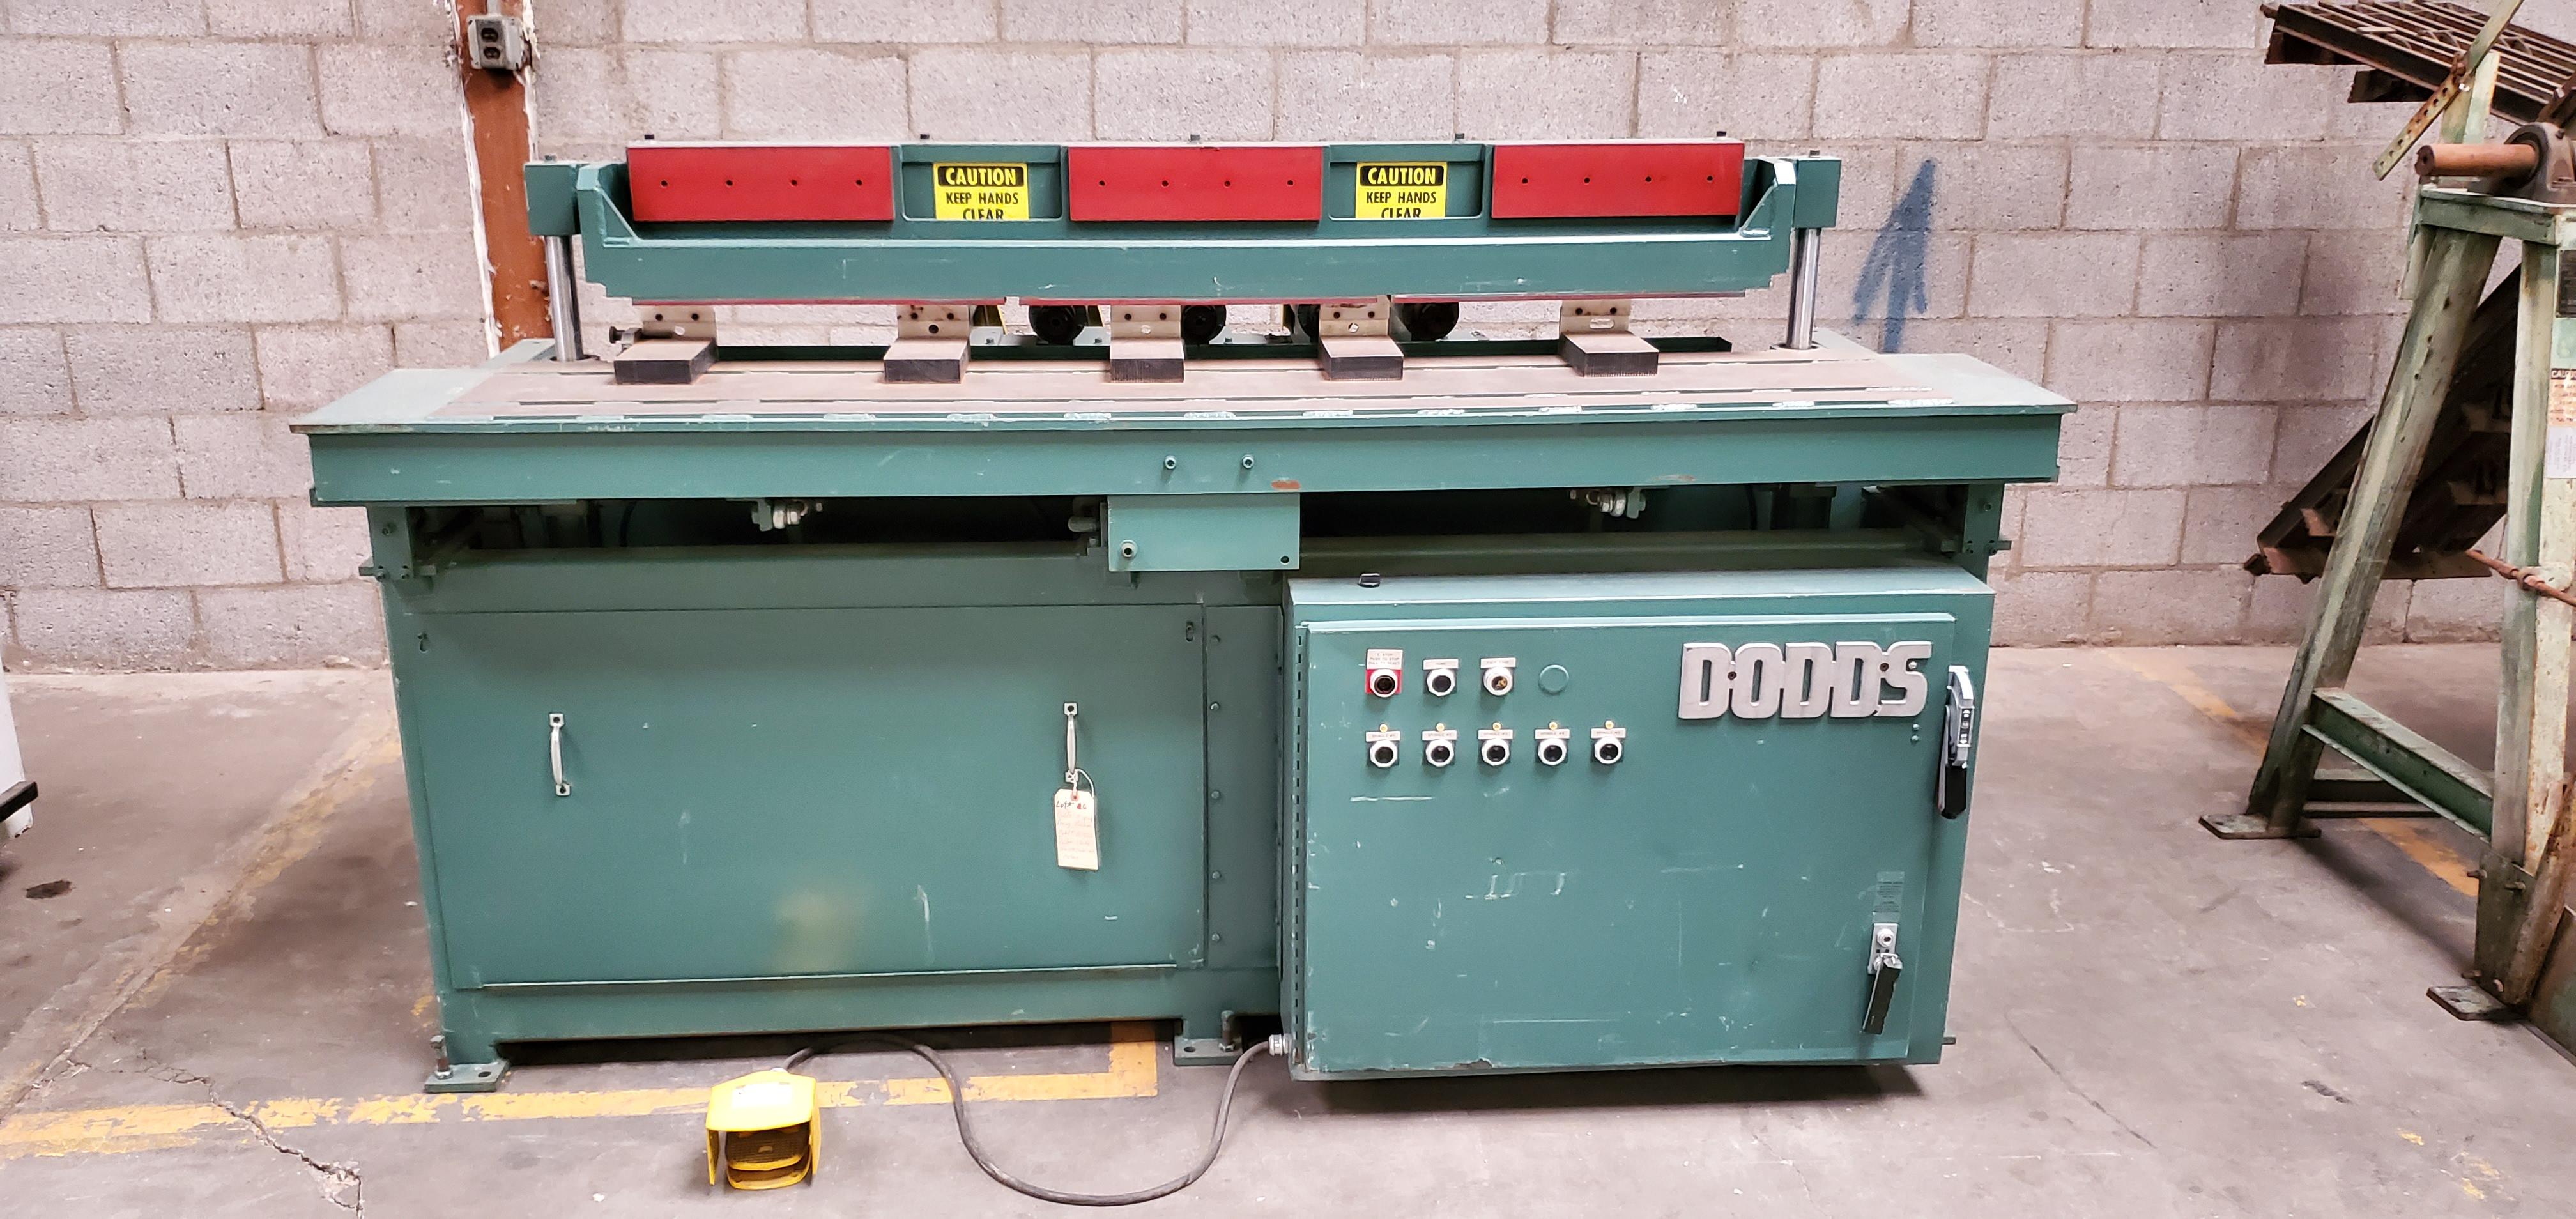 Dodds 5-Spindle Boring Machine, Model: B-802 Baldor 1.5HP 208-230/460 Volts (5 Motors)